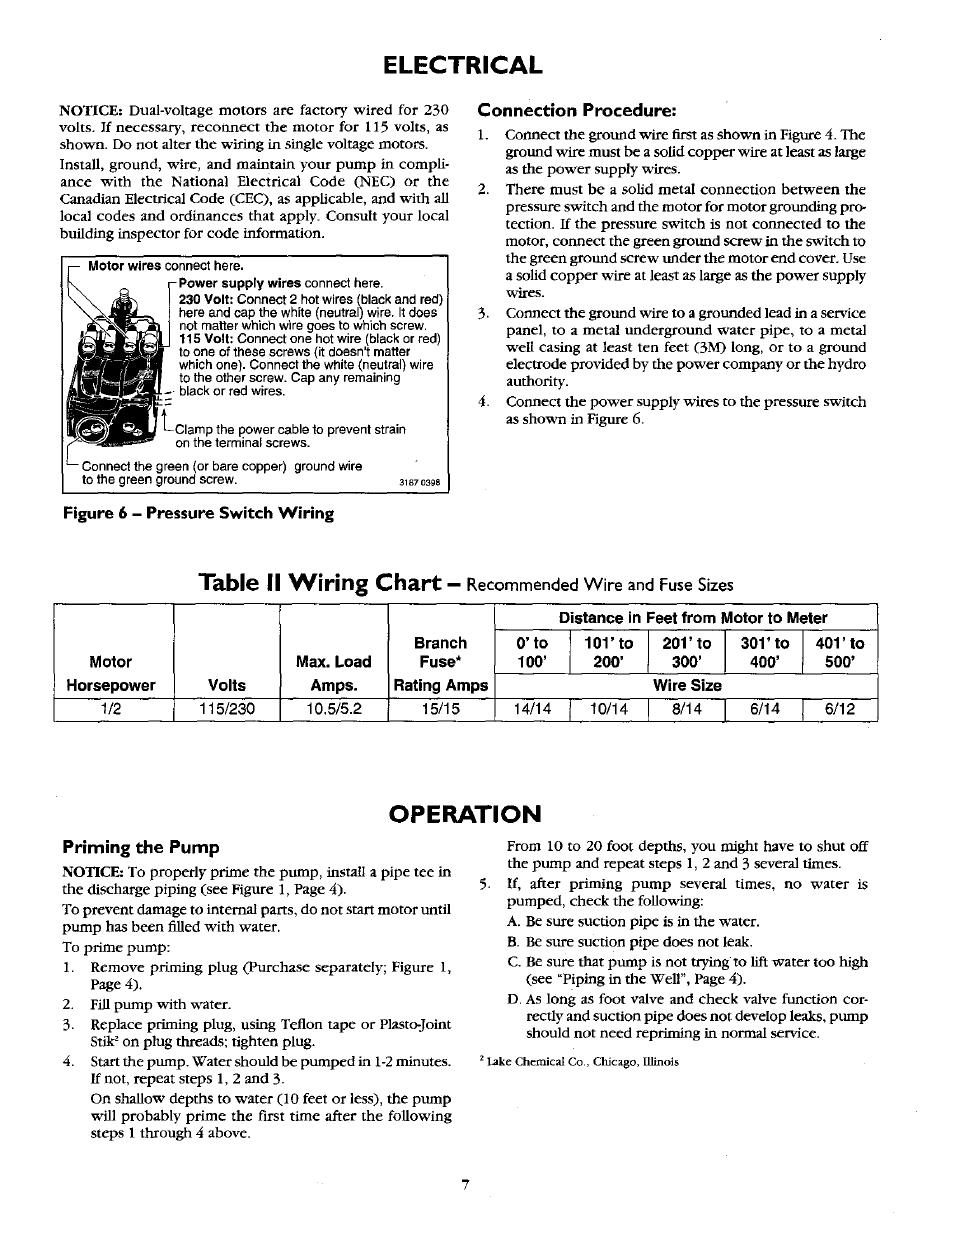 electrical connection procedure operation sears 390 2521 user rh manualsdir com Craftsman Instruction Manual Craftsman Instruction Manual